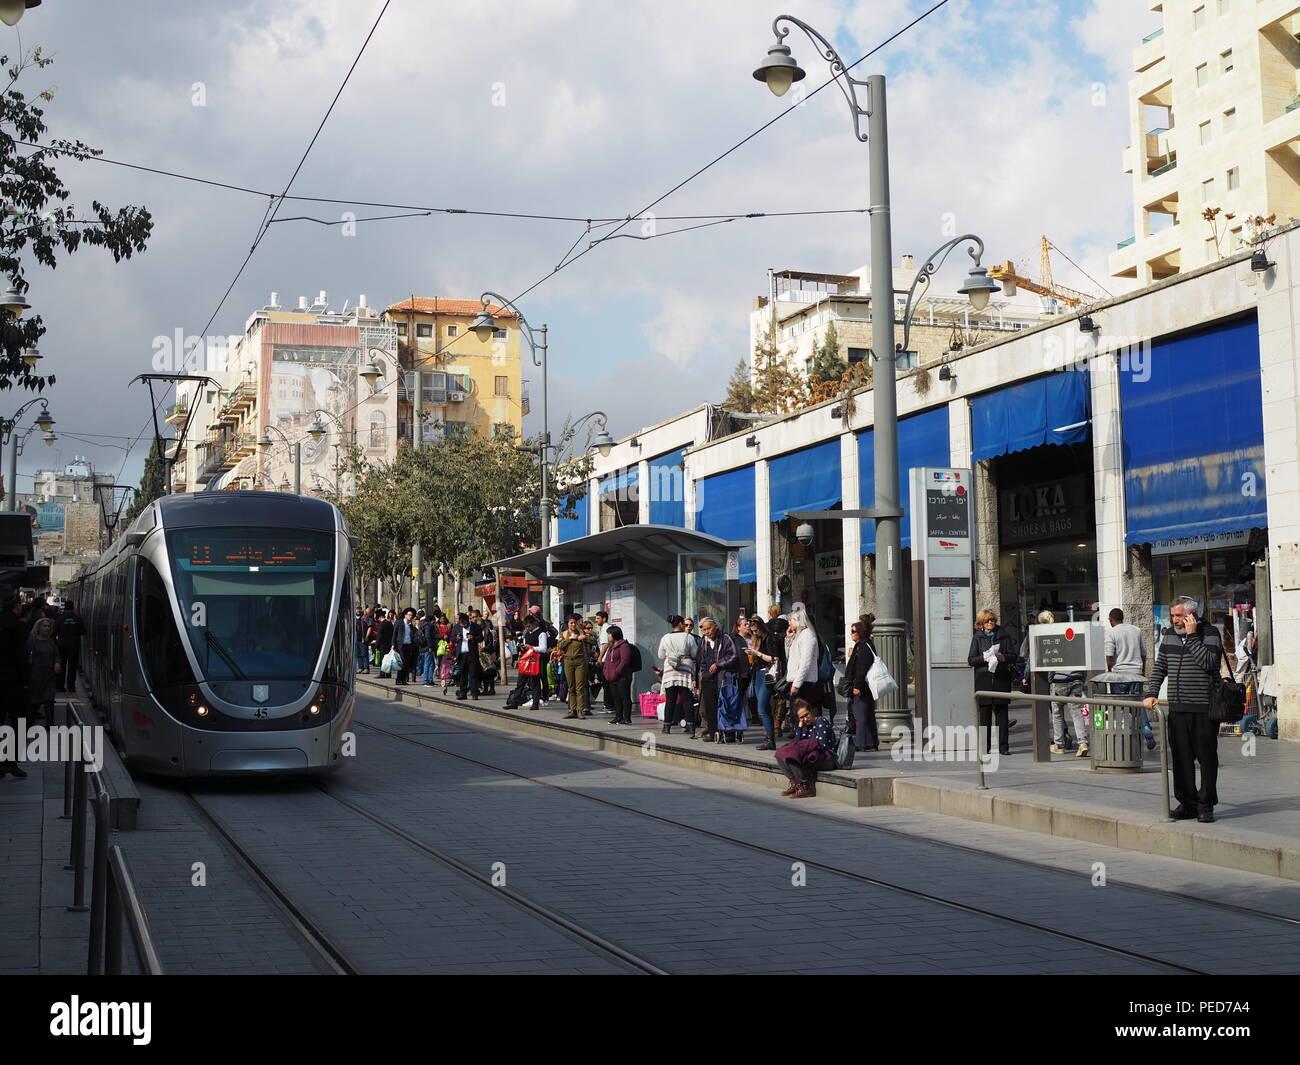 Jaffa Road with Light Rail, Jerusalem, Israel - Stock Image